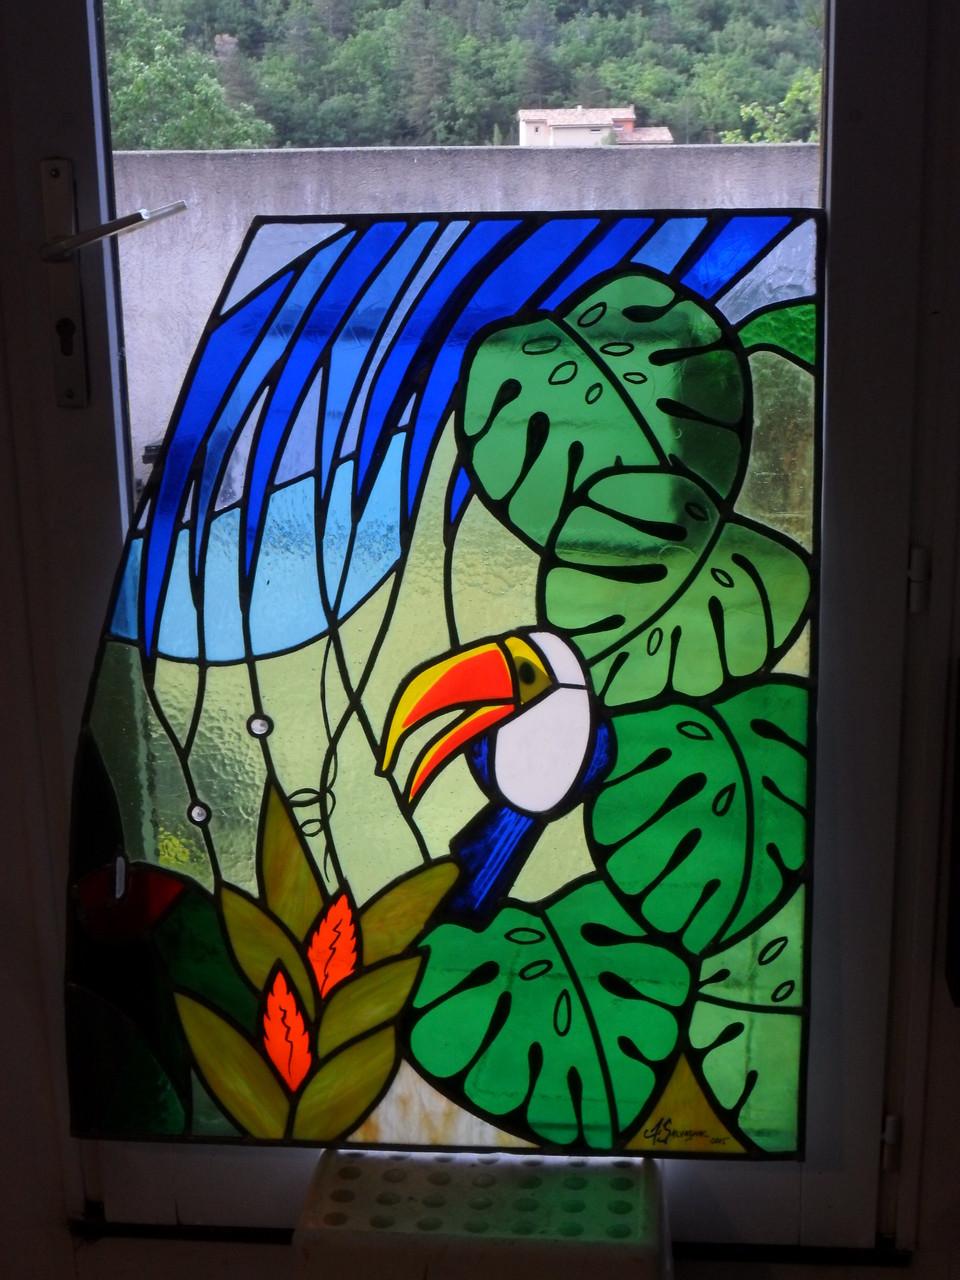 vitrail Jungle triptyque 3 - Art du vitrail - Puimisson 34